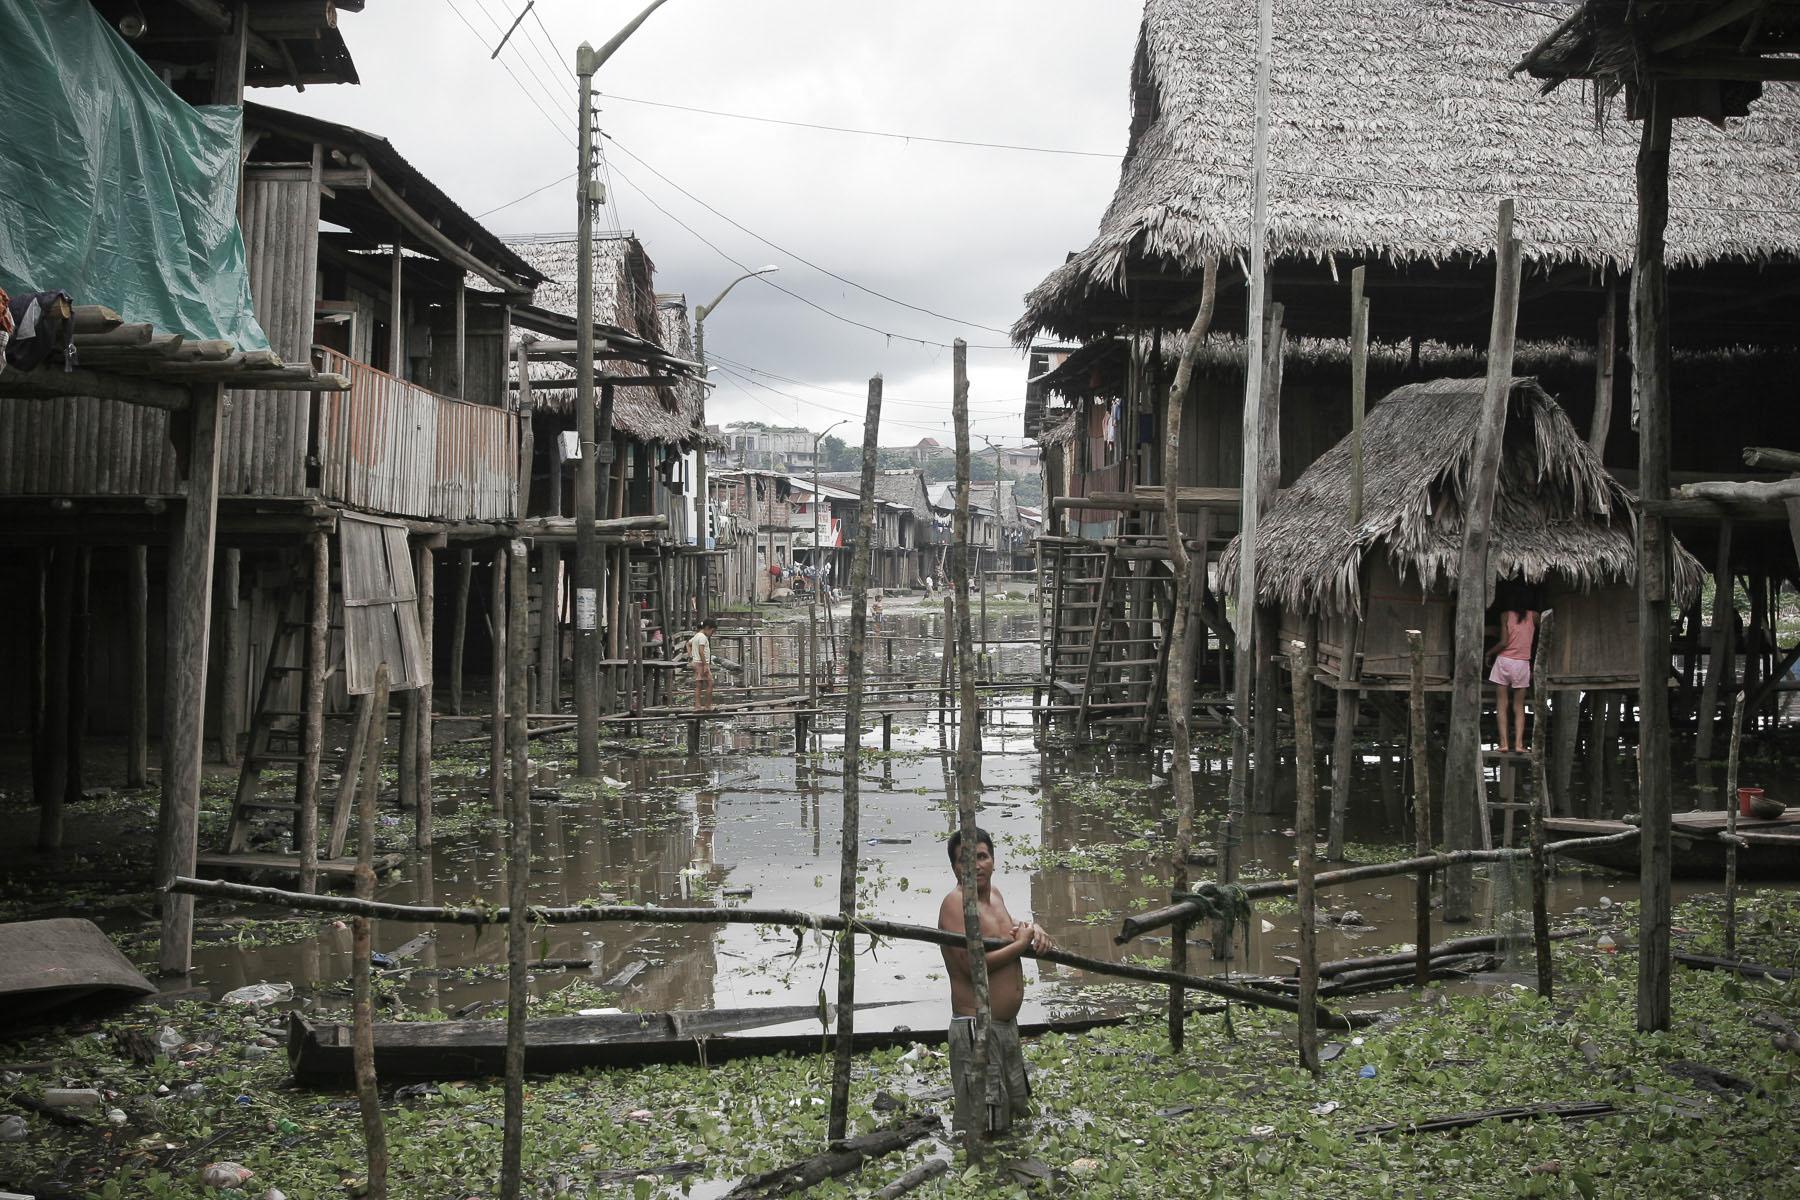 Belém, a shanty town built on the Amazon River on April 2005